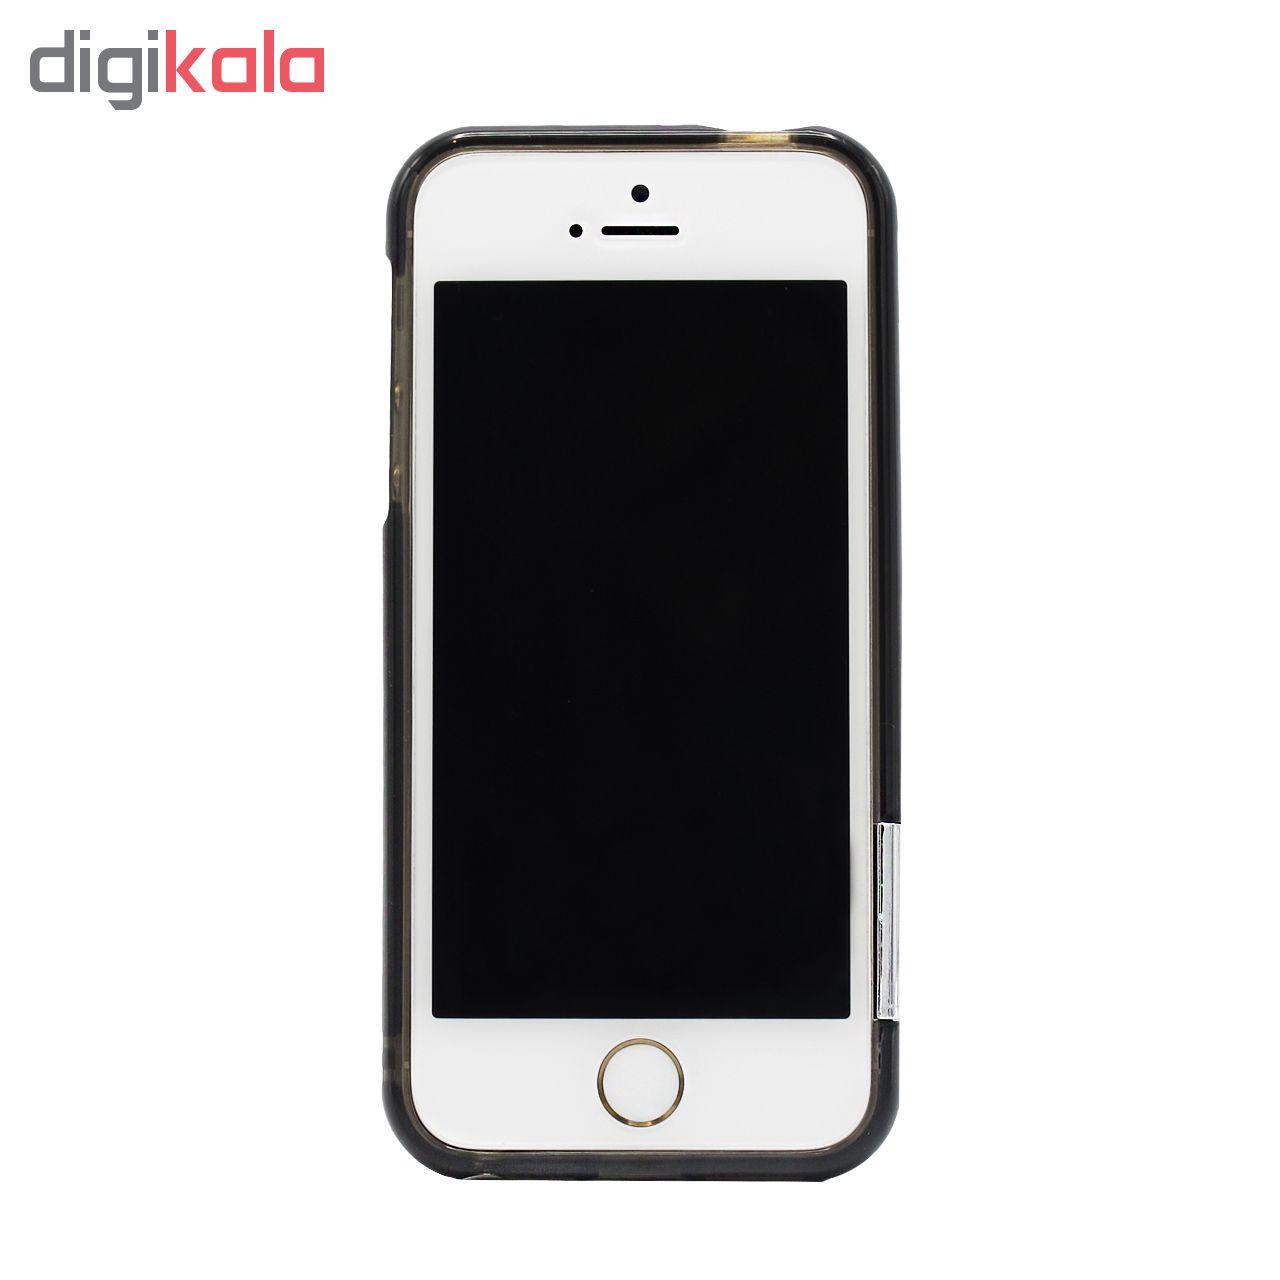 بامپر More مدل GEM مناسب برای گوشی موبایل اپل iPhone 5/5s/5se main 1 2